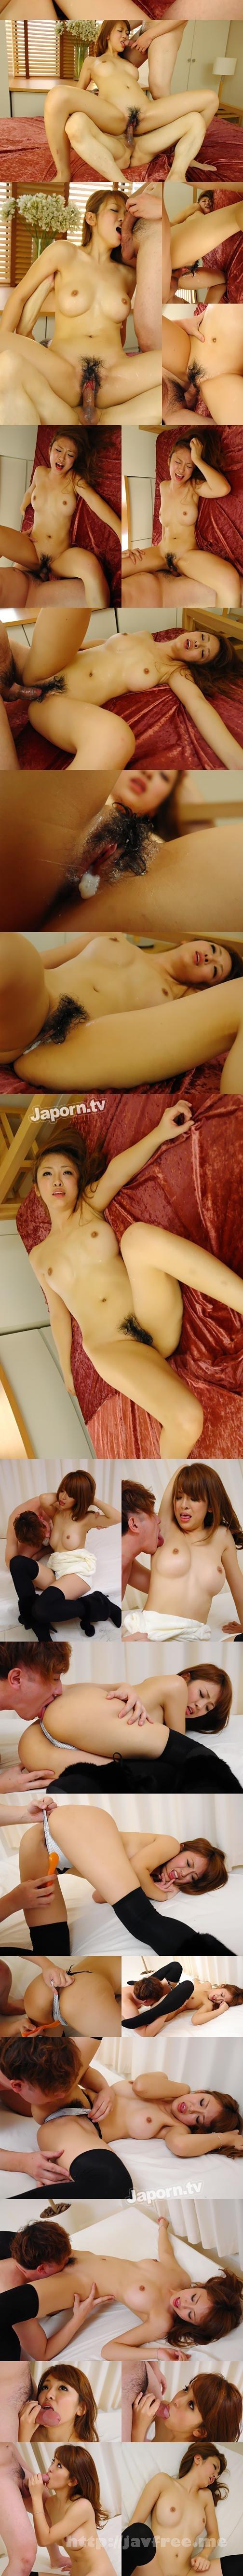 [TEK-080] 唾液を絡める濃厚接吻セックス 三上悠亜 Uncensored - image SKYHD-069_3 on https://javfree.me